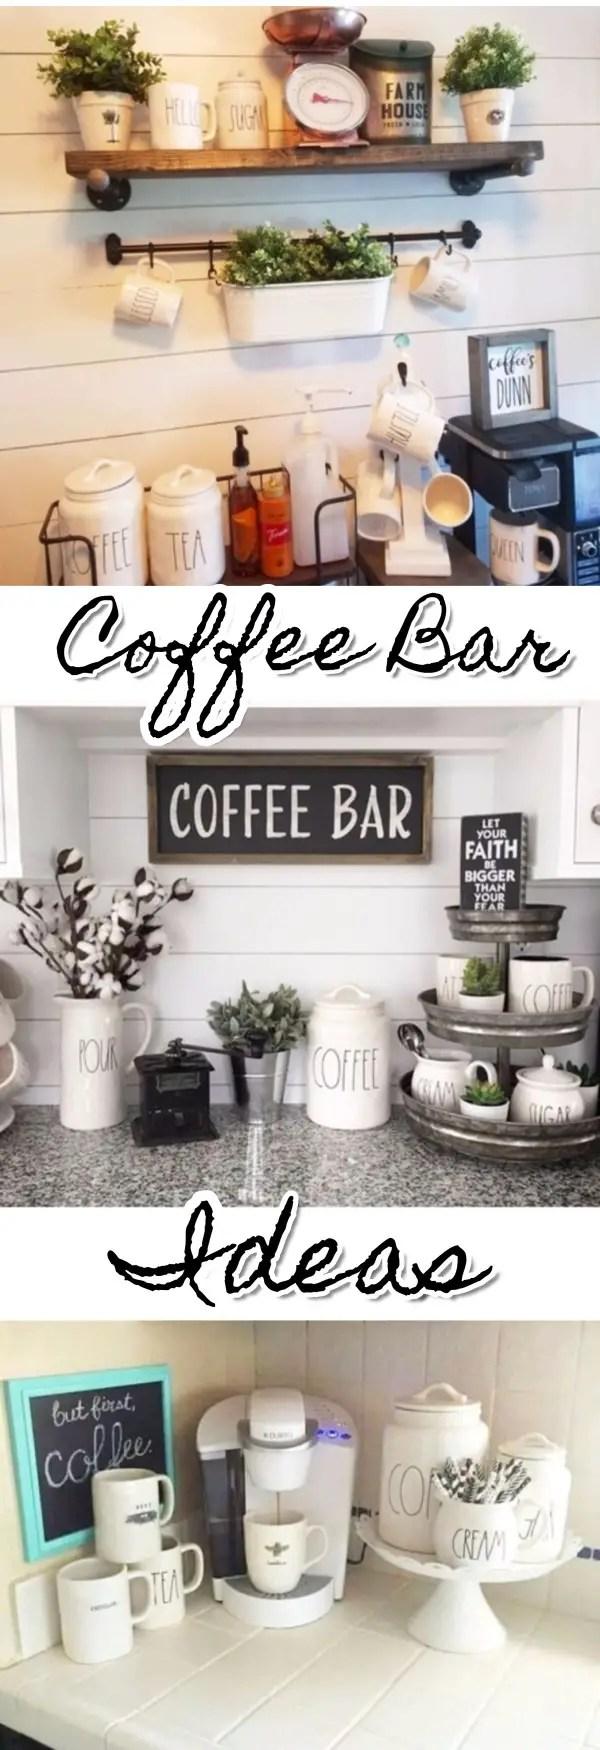 Coffee bar set up and organization ideas